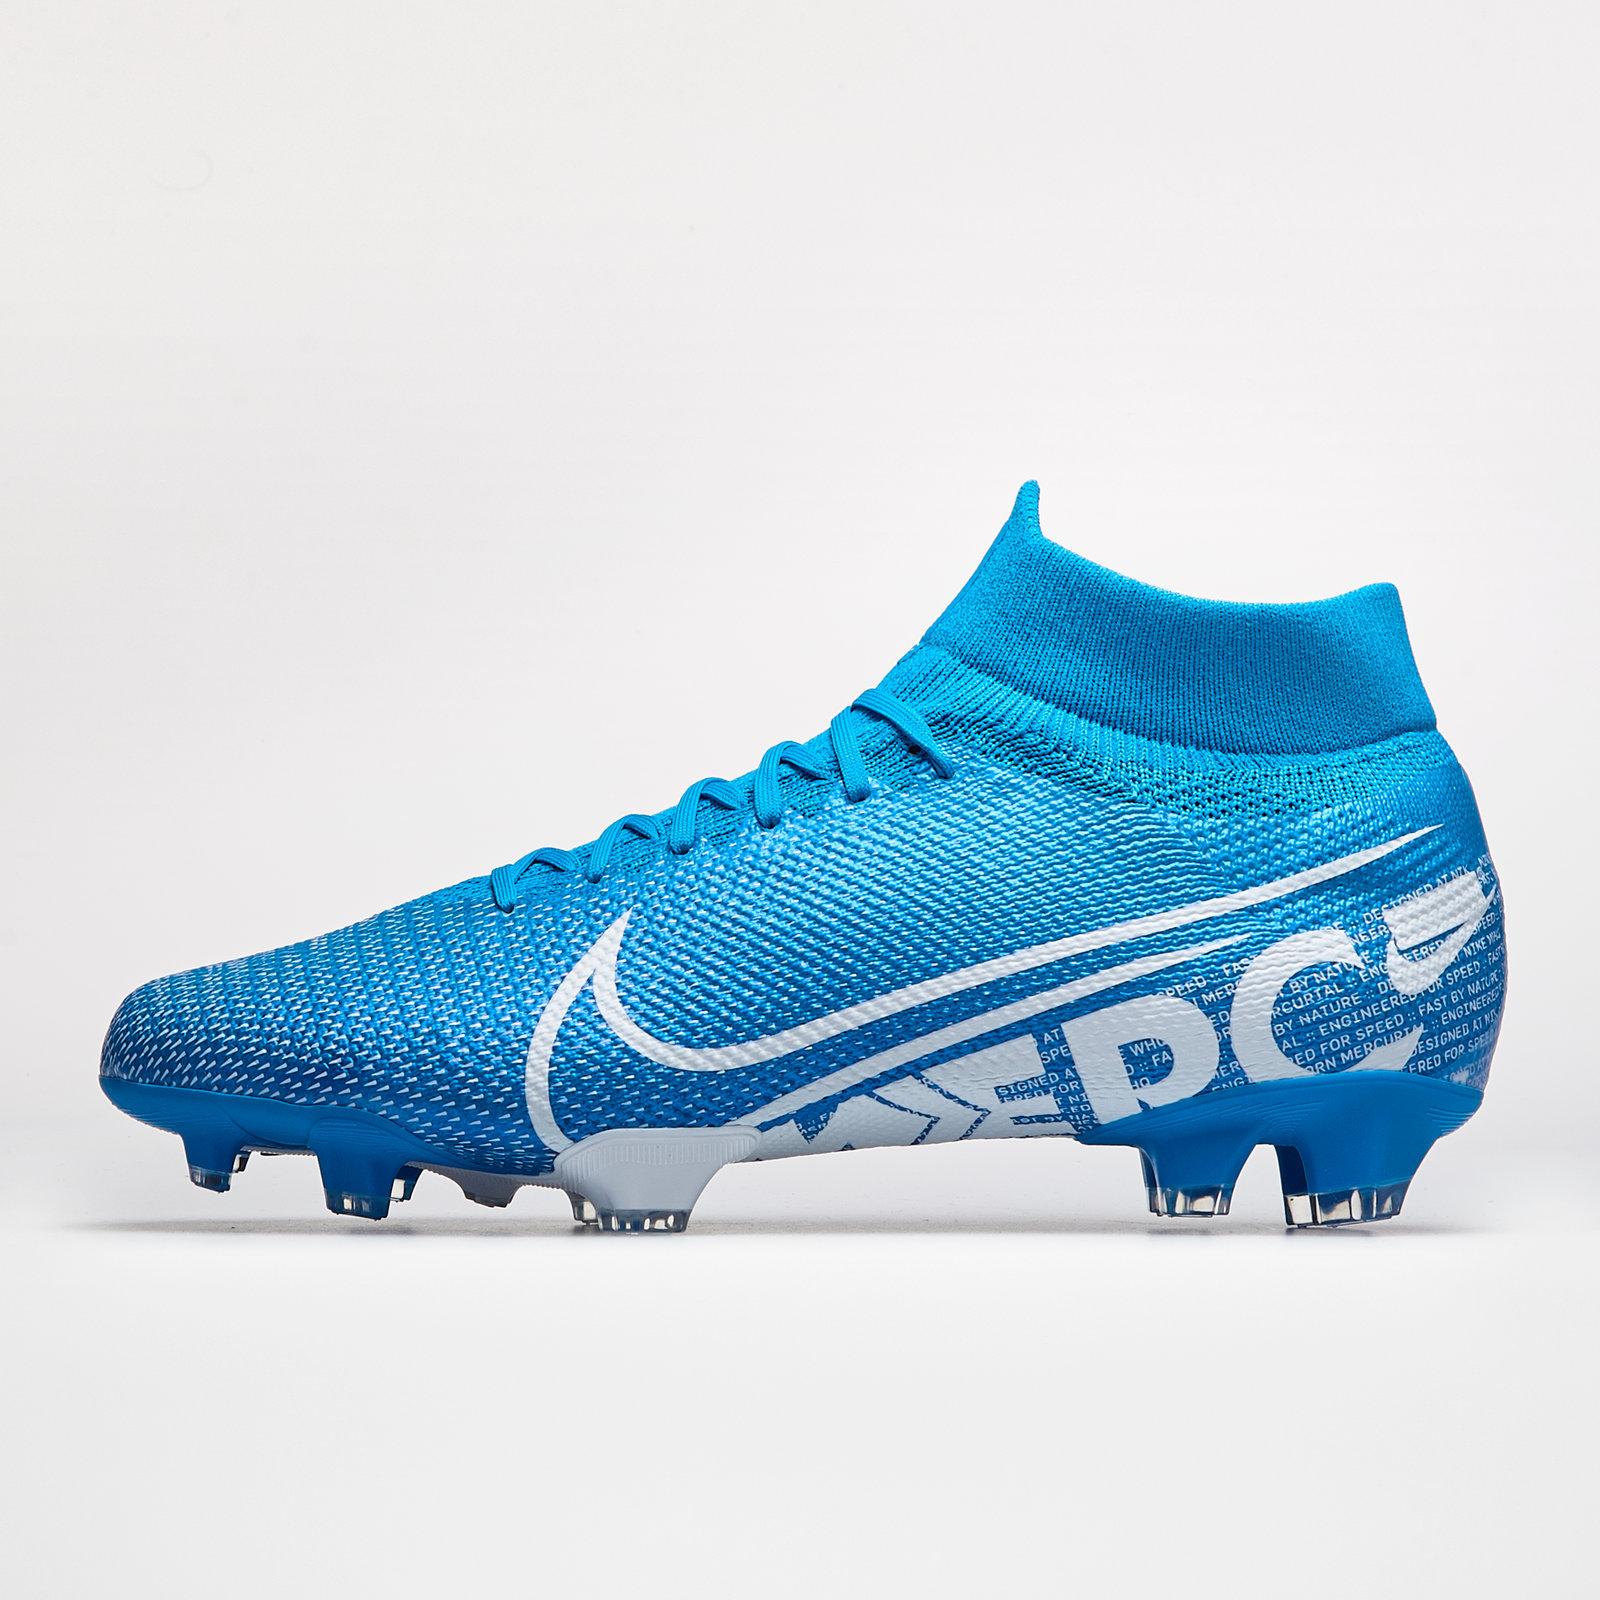 la meilleure attitude c2fb9 973c6 Nike Mercurial Football Boots   Cheap Superfly & Vapor